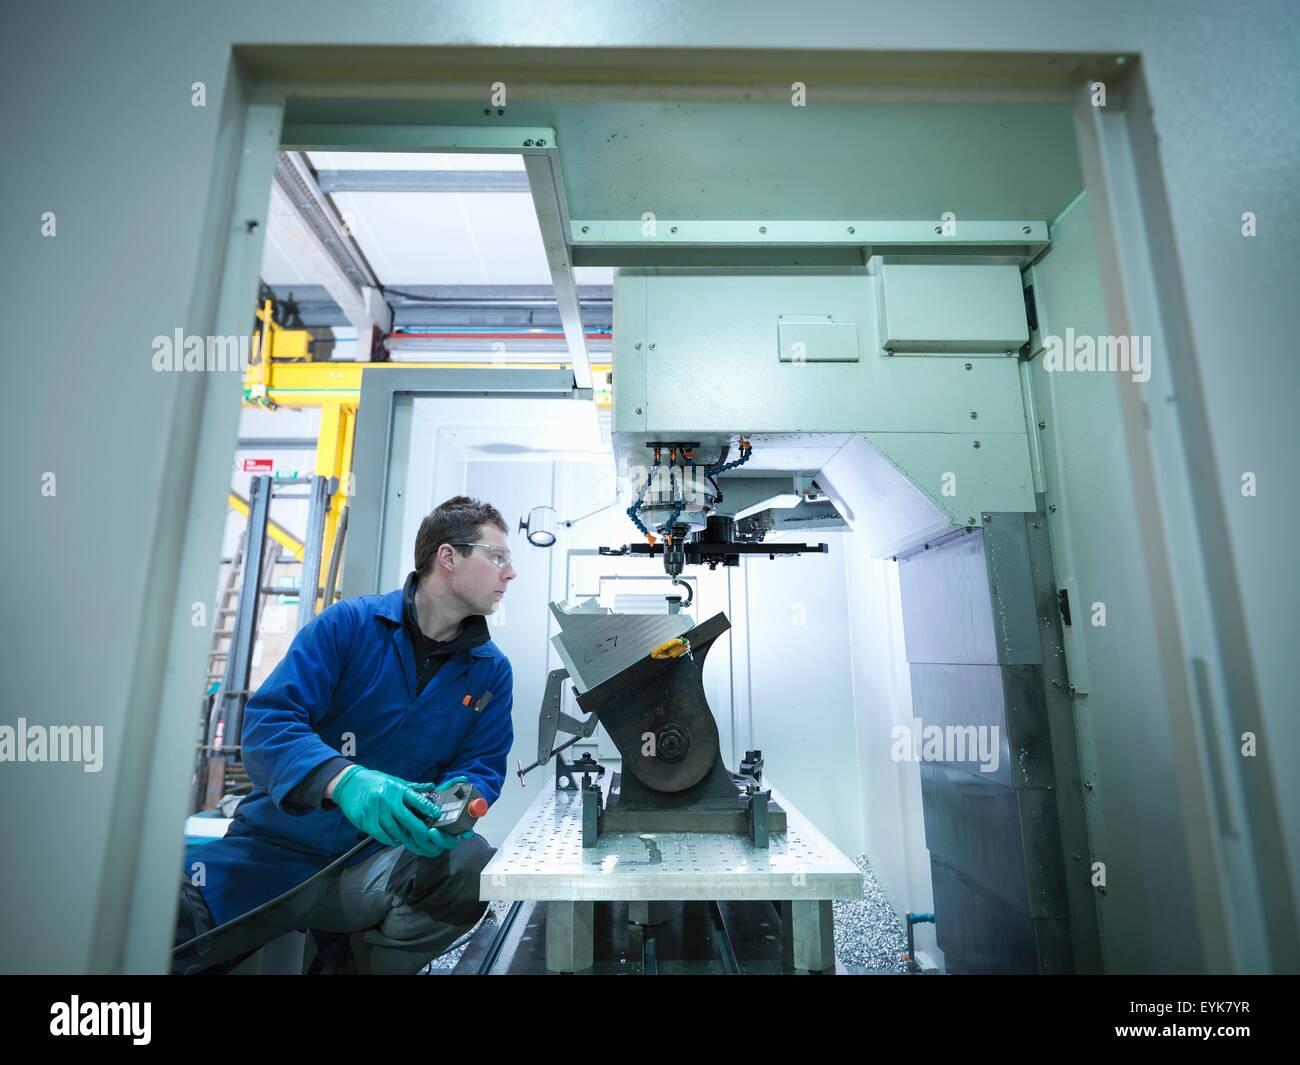 Worker using CNC machine in plastics factory - Stock Image